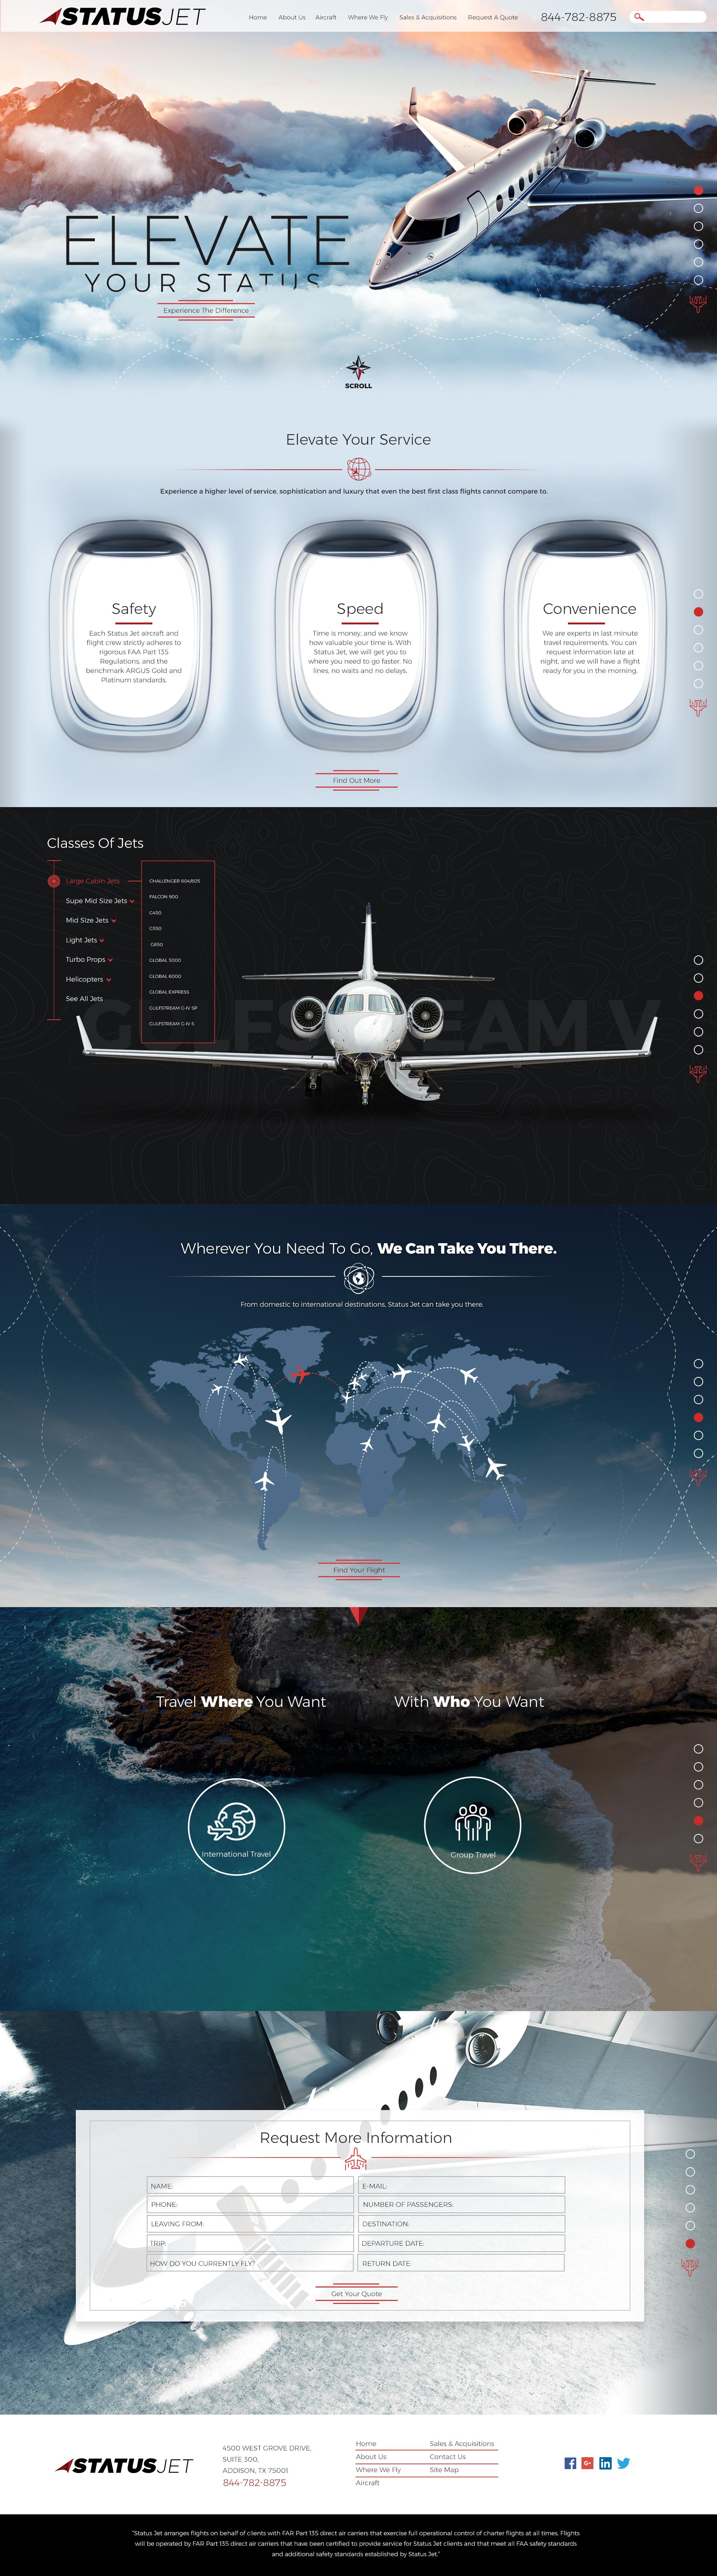 Web Design (Scorpion Internet Marketing): Status Jet-Transportation Website